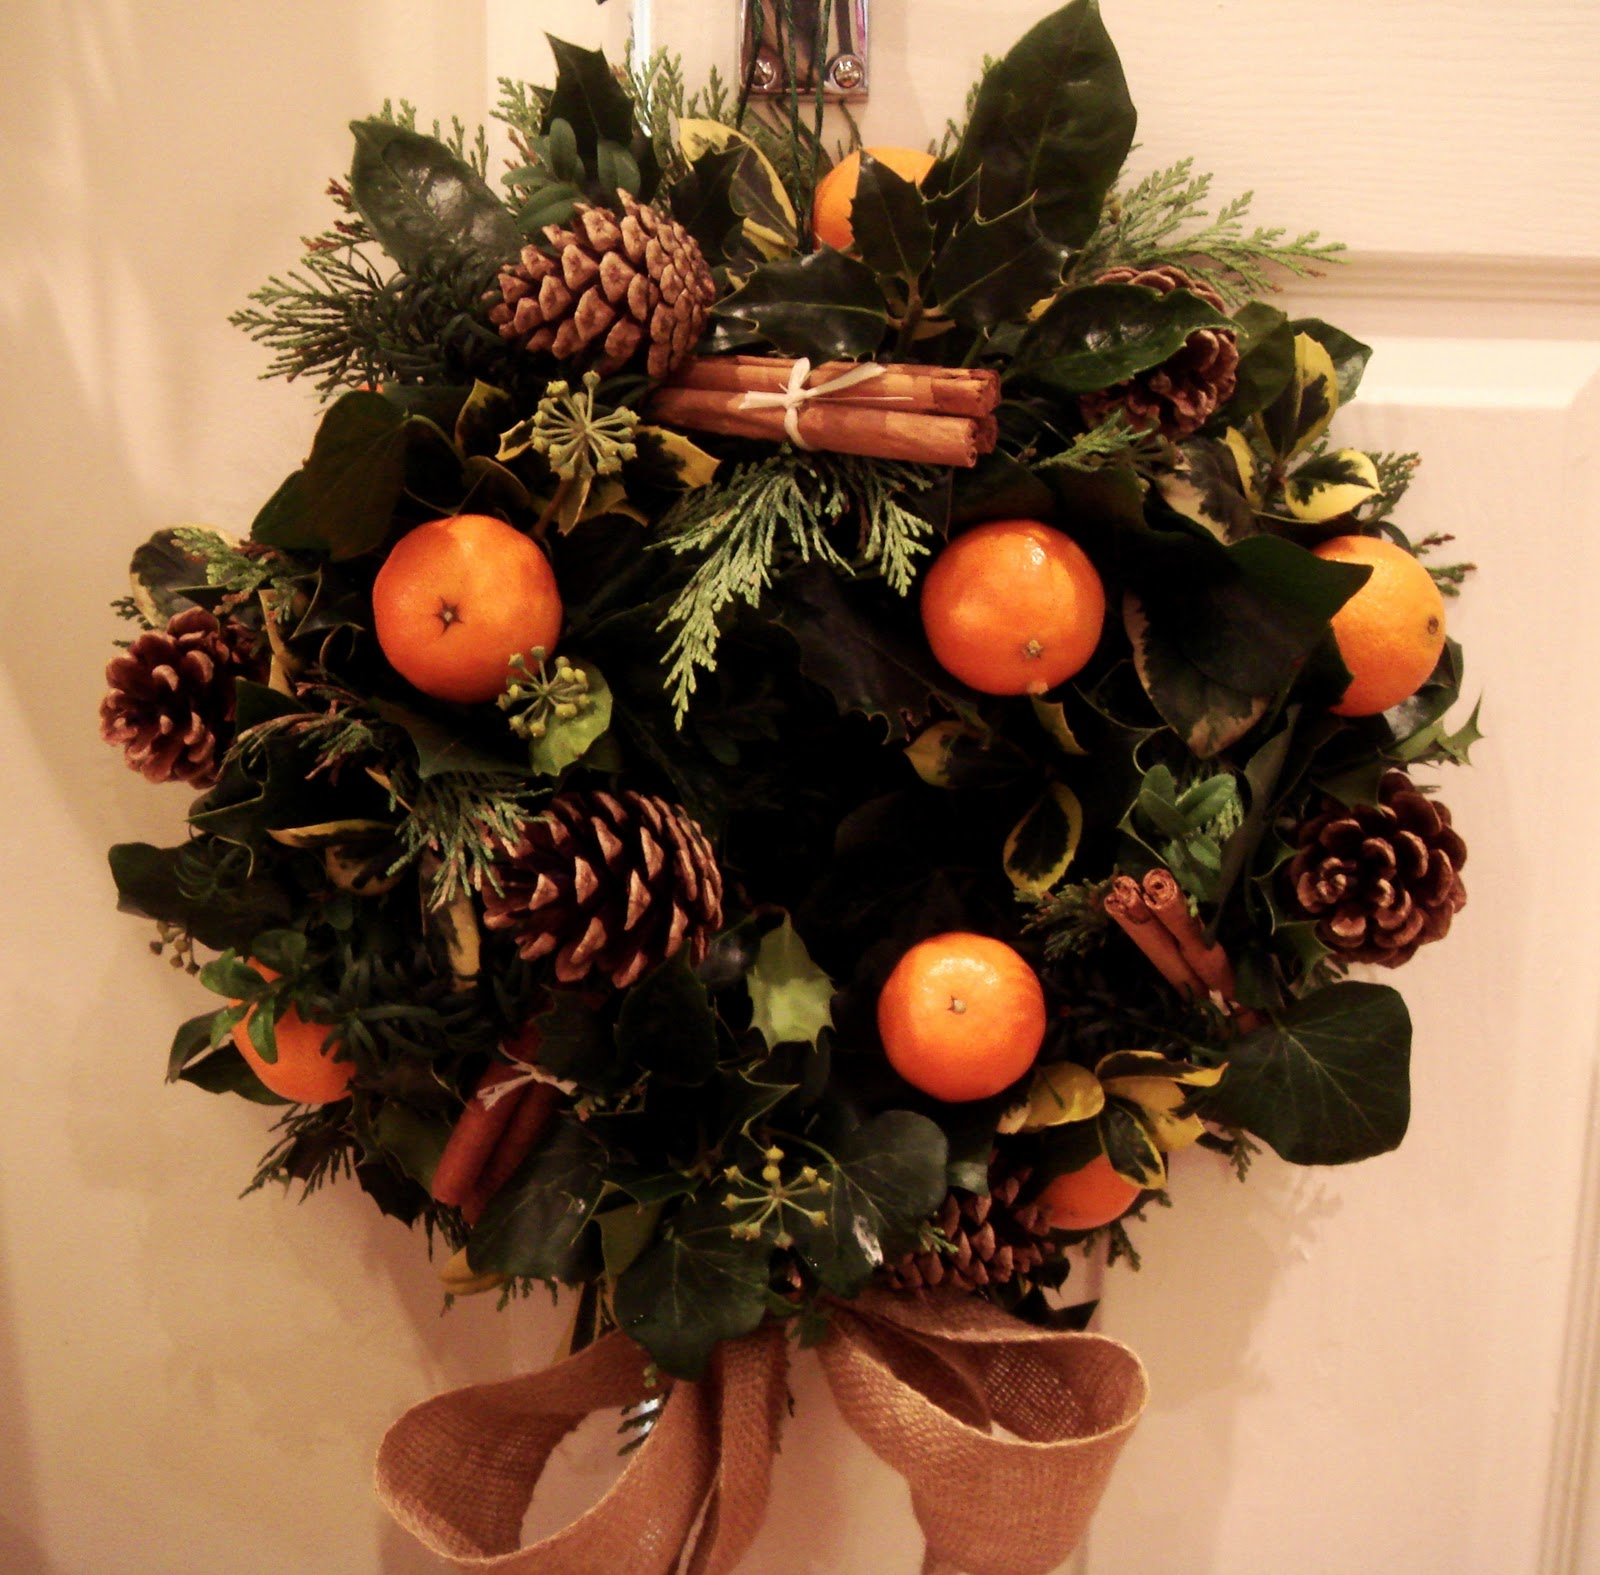 Nora s ilkley fresh christmas wreaths